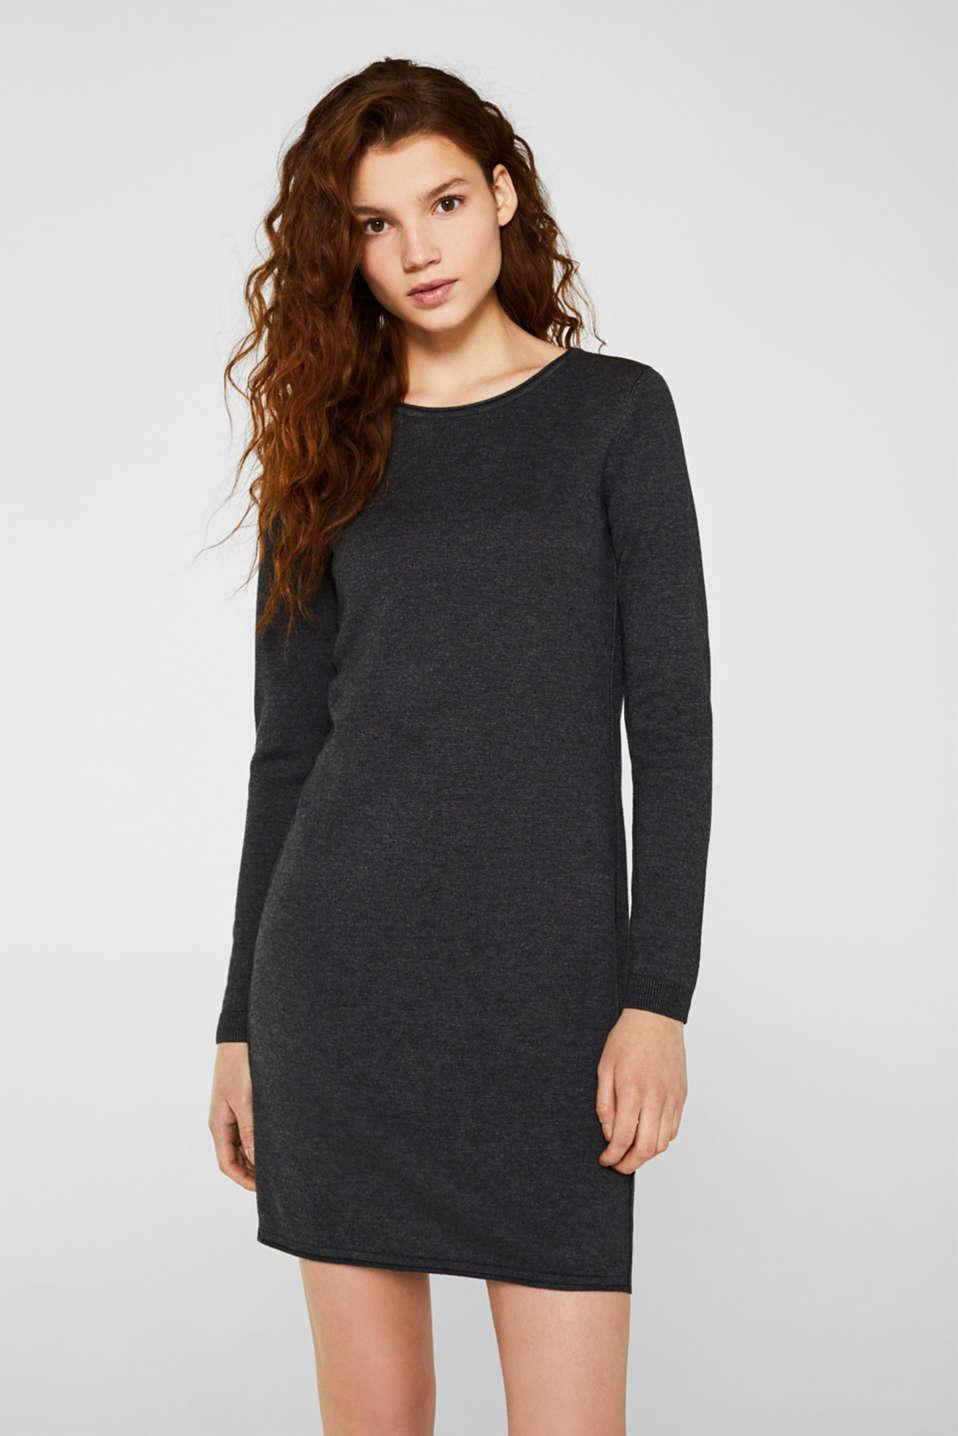 Dresses flat knitted, DARK GREY 5, detail image number 0